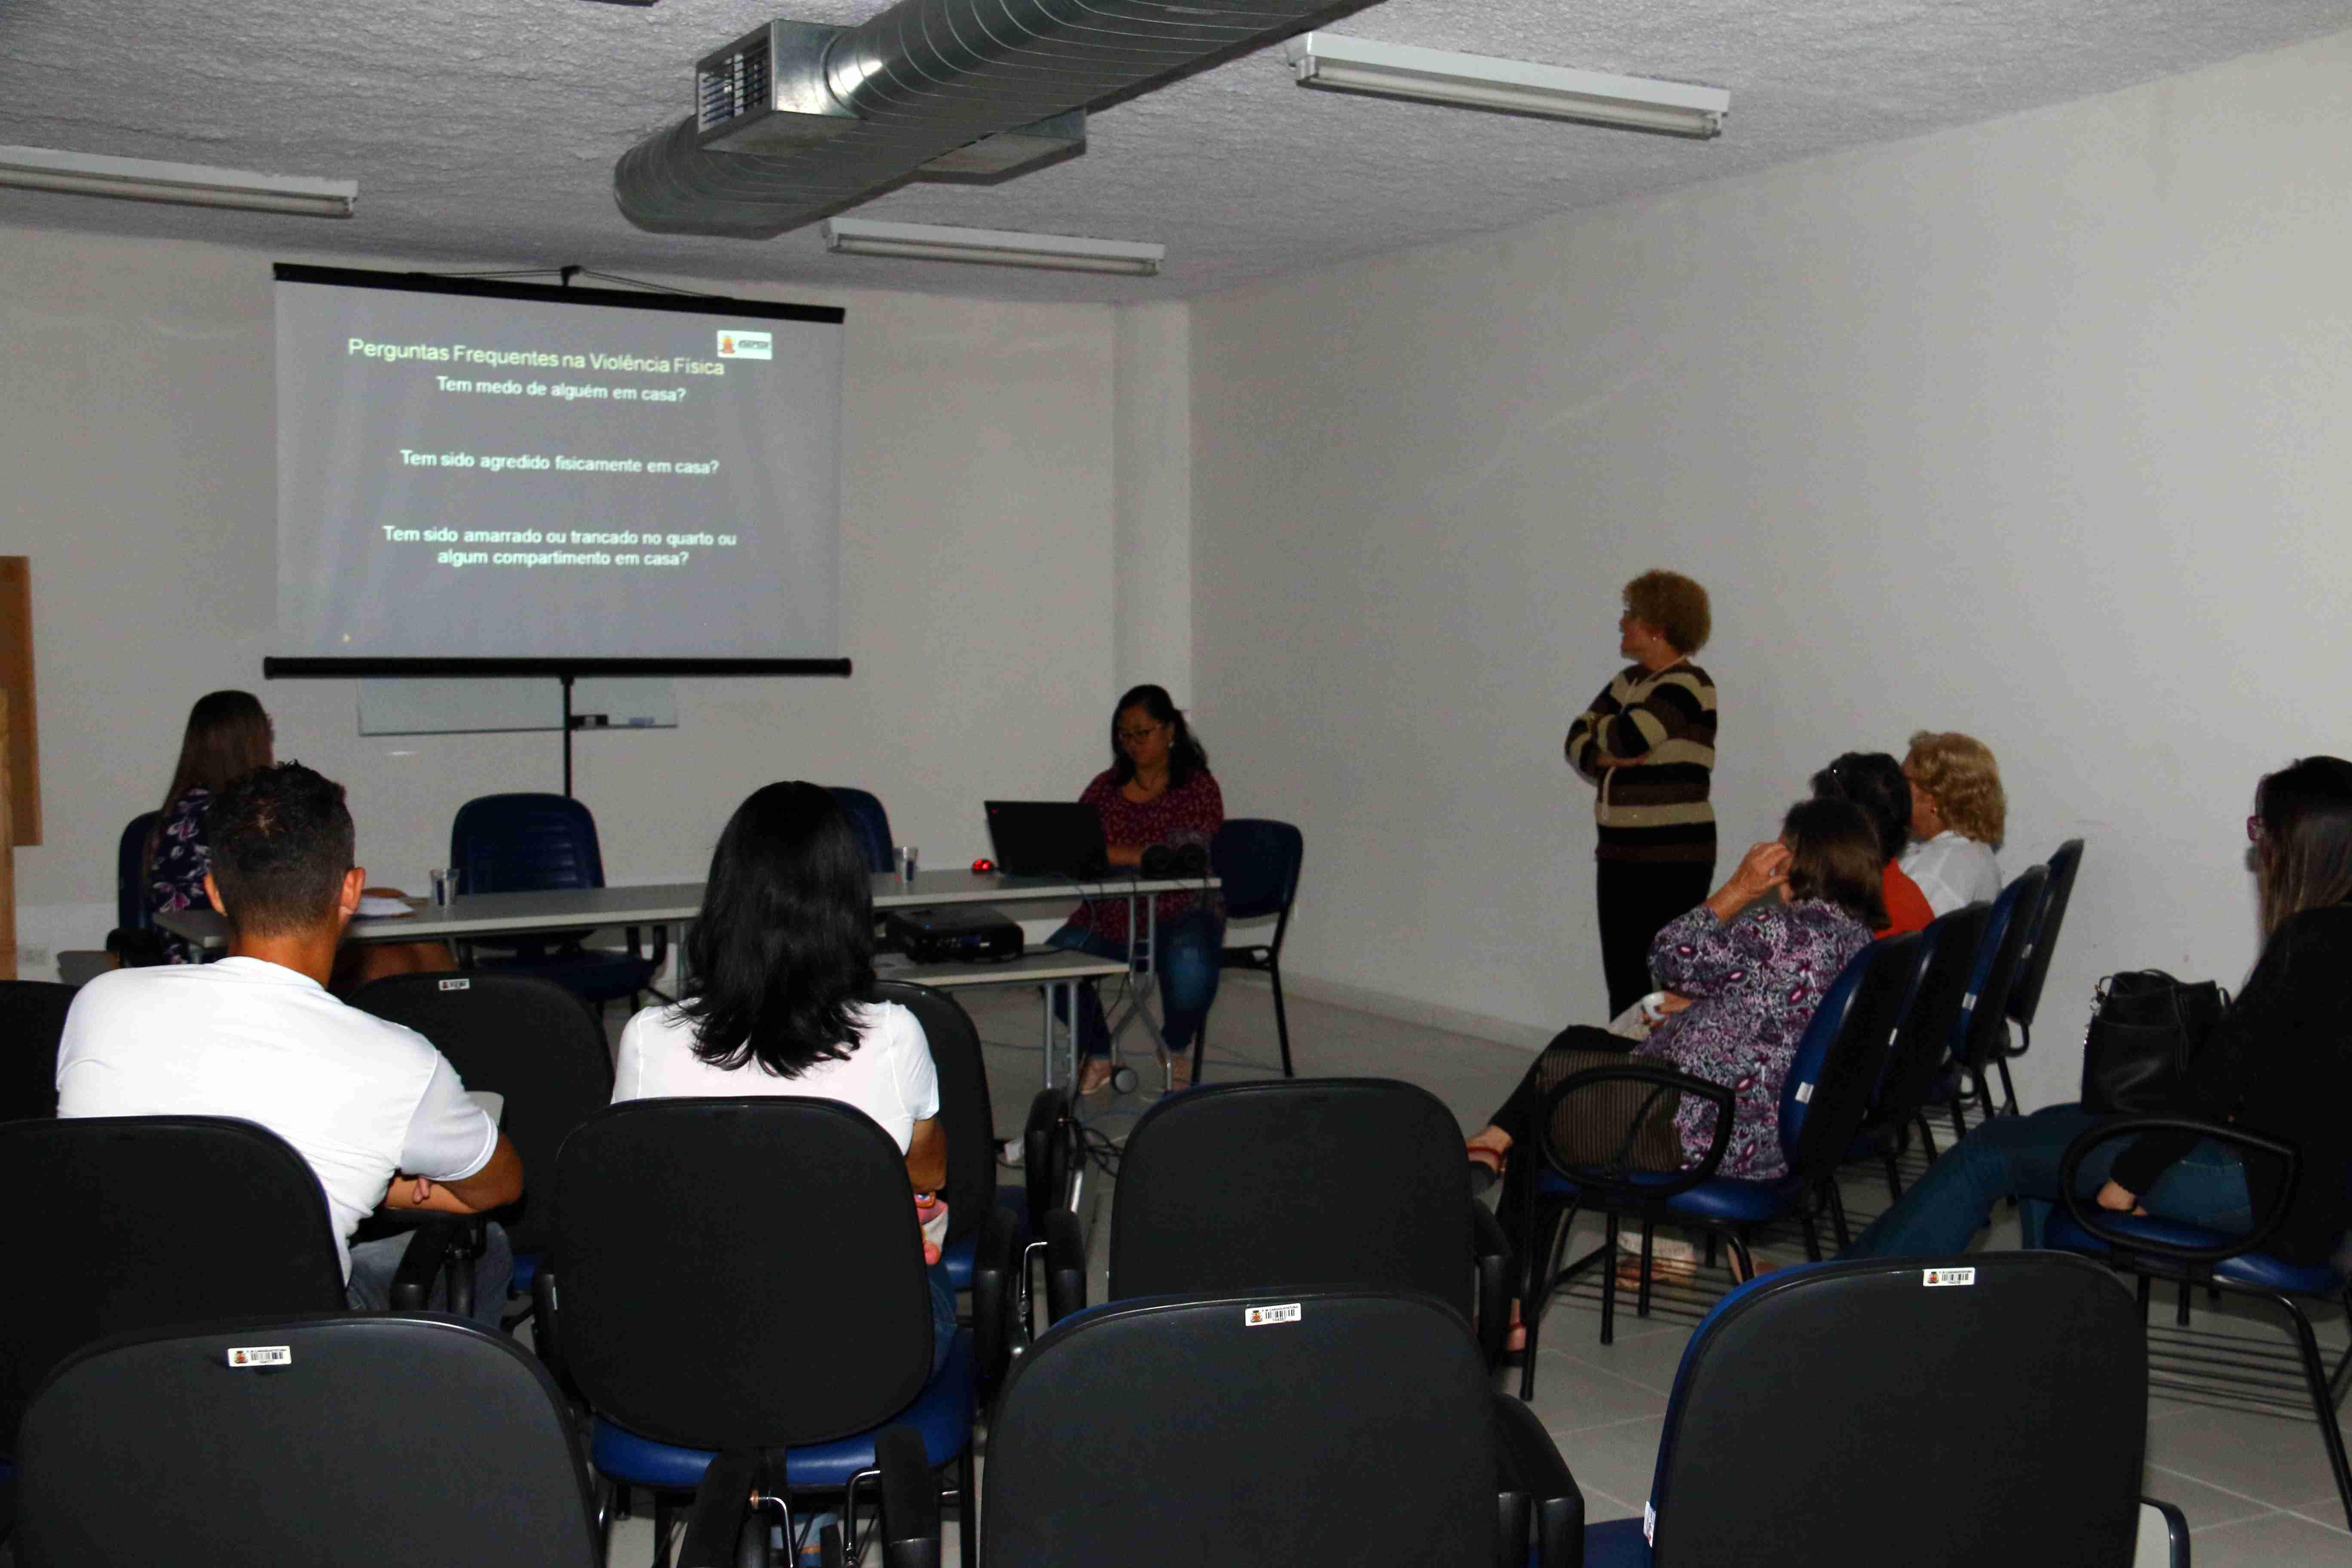 Sepedi promove discussão sobre violência contra a pessoa idosa (Foto: Gustavo Grunewald/PMC)